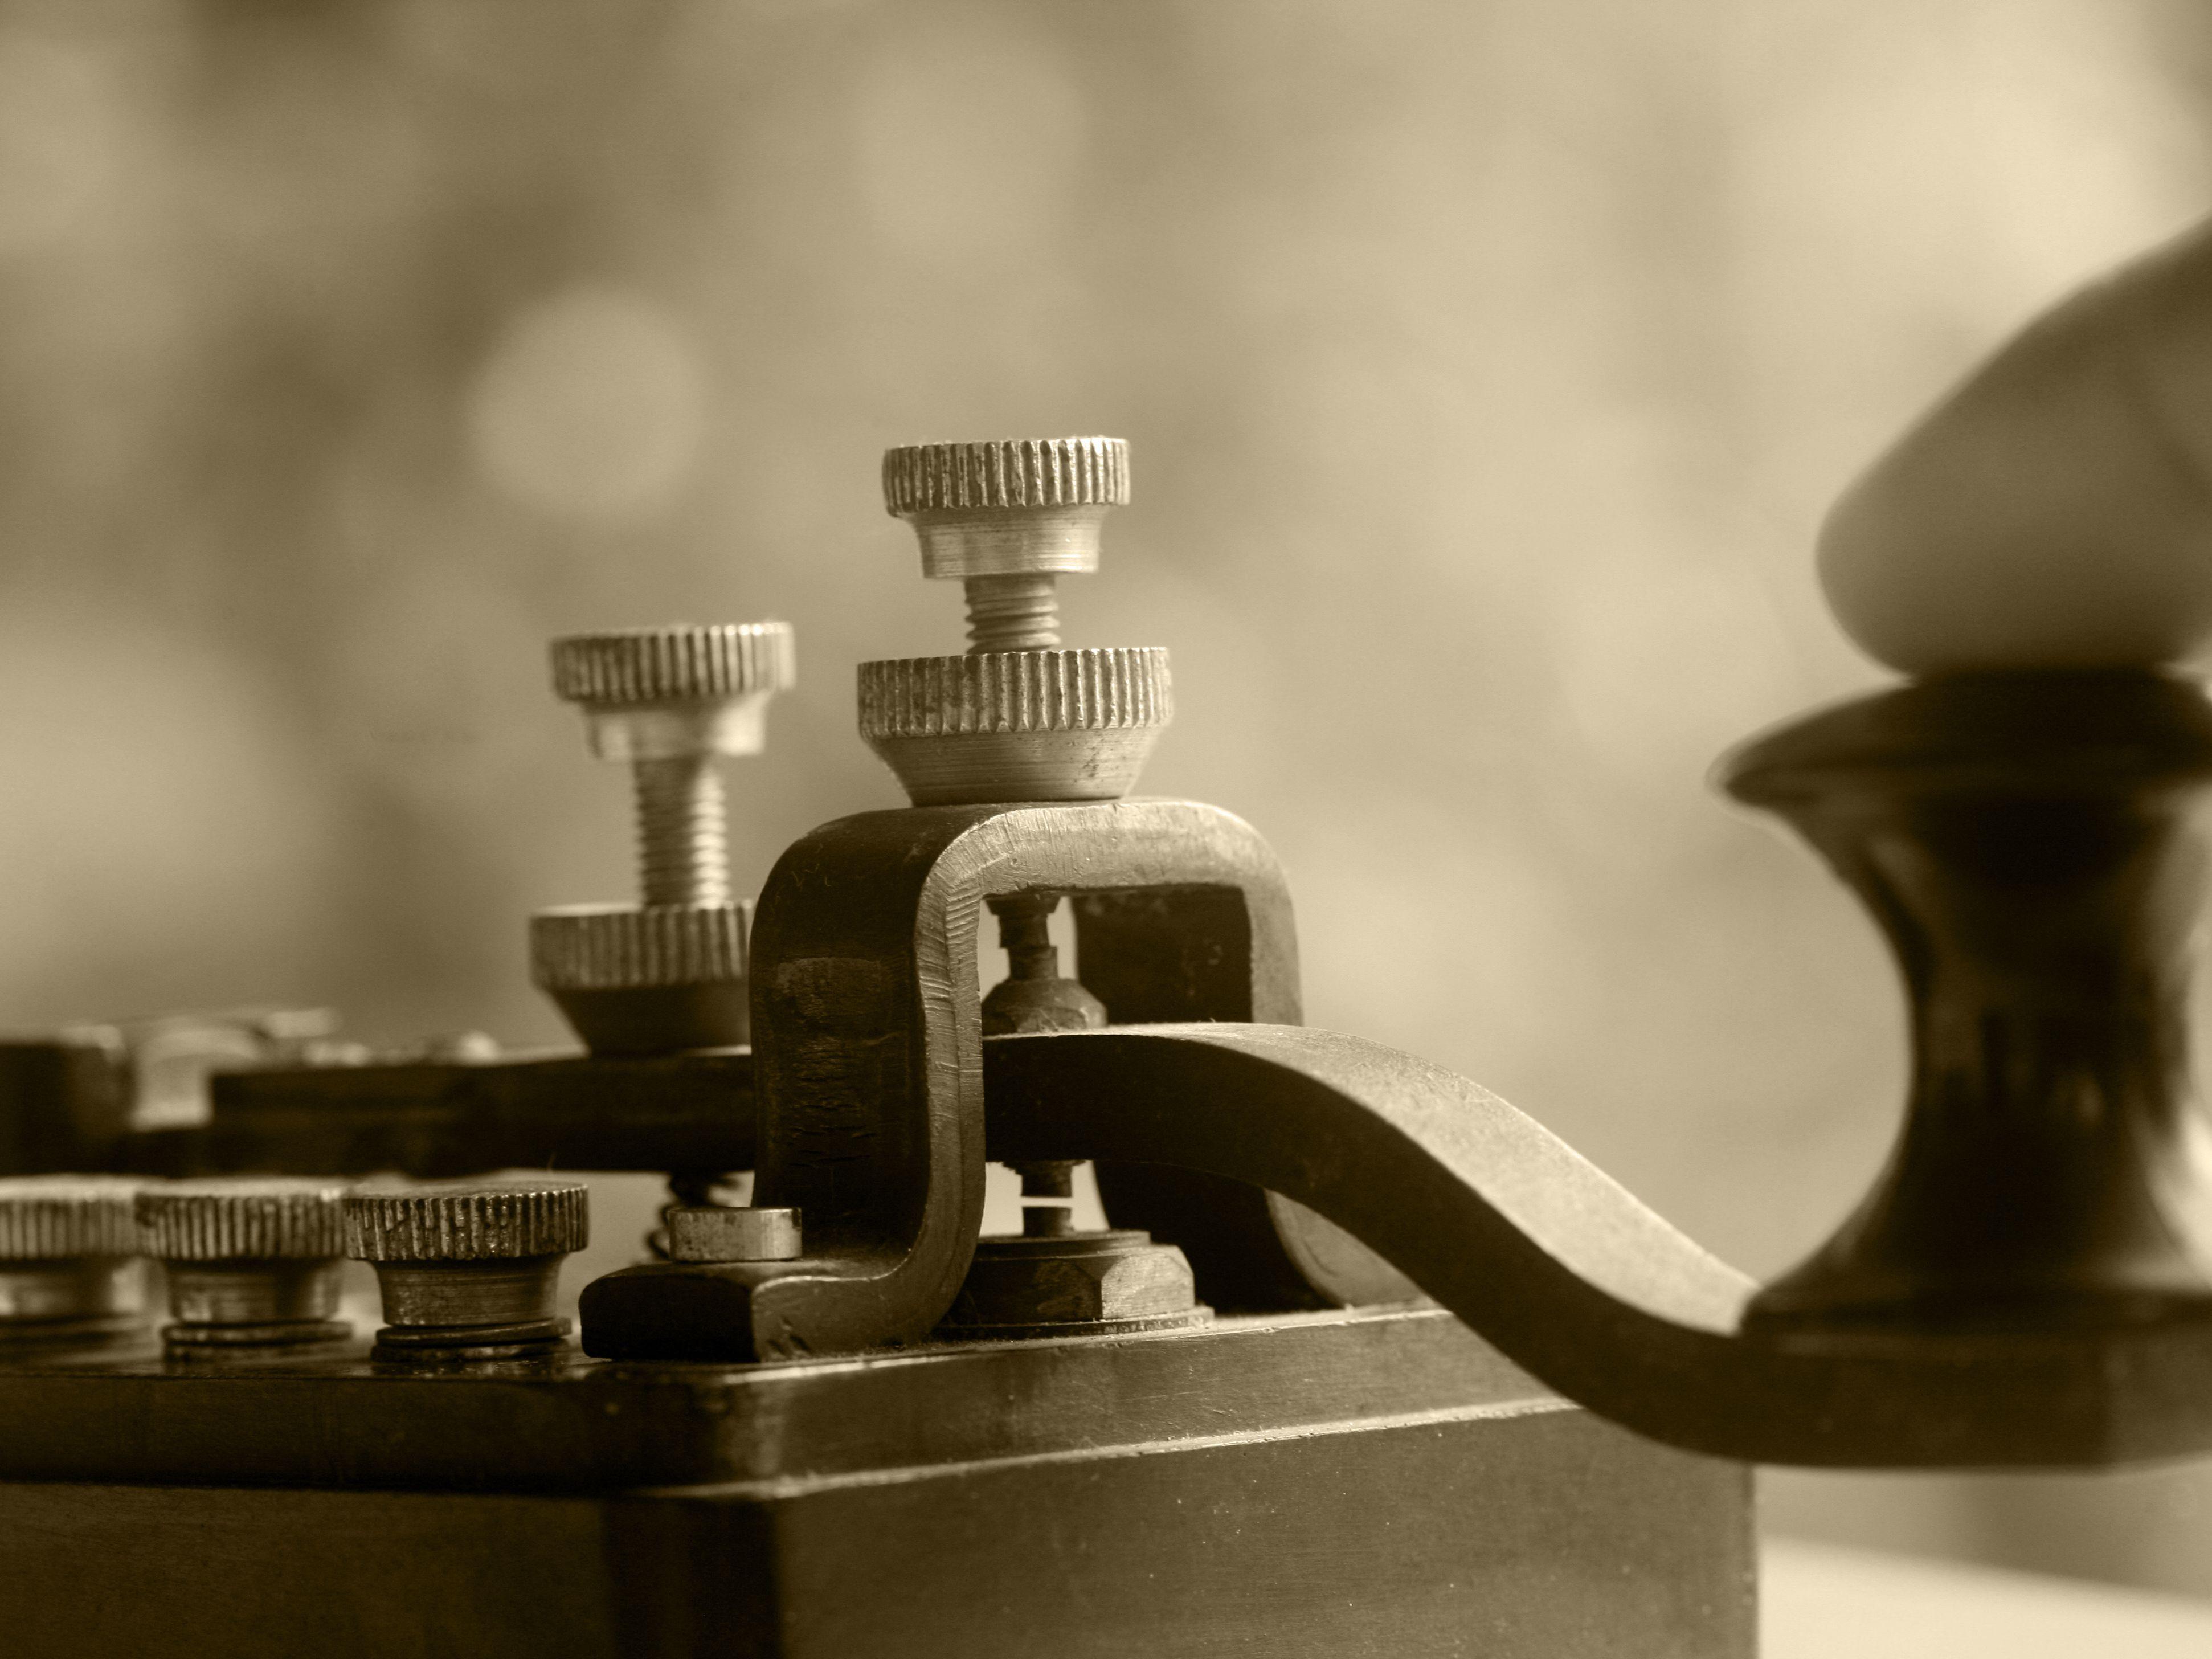 Strategies To Learn Morse Code